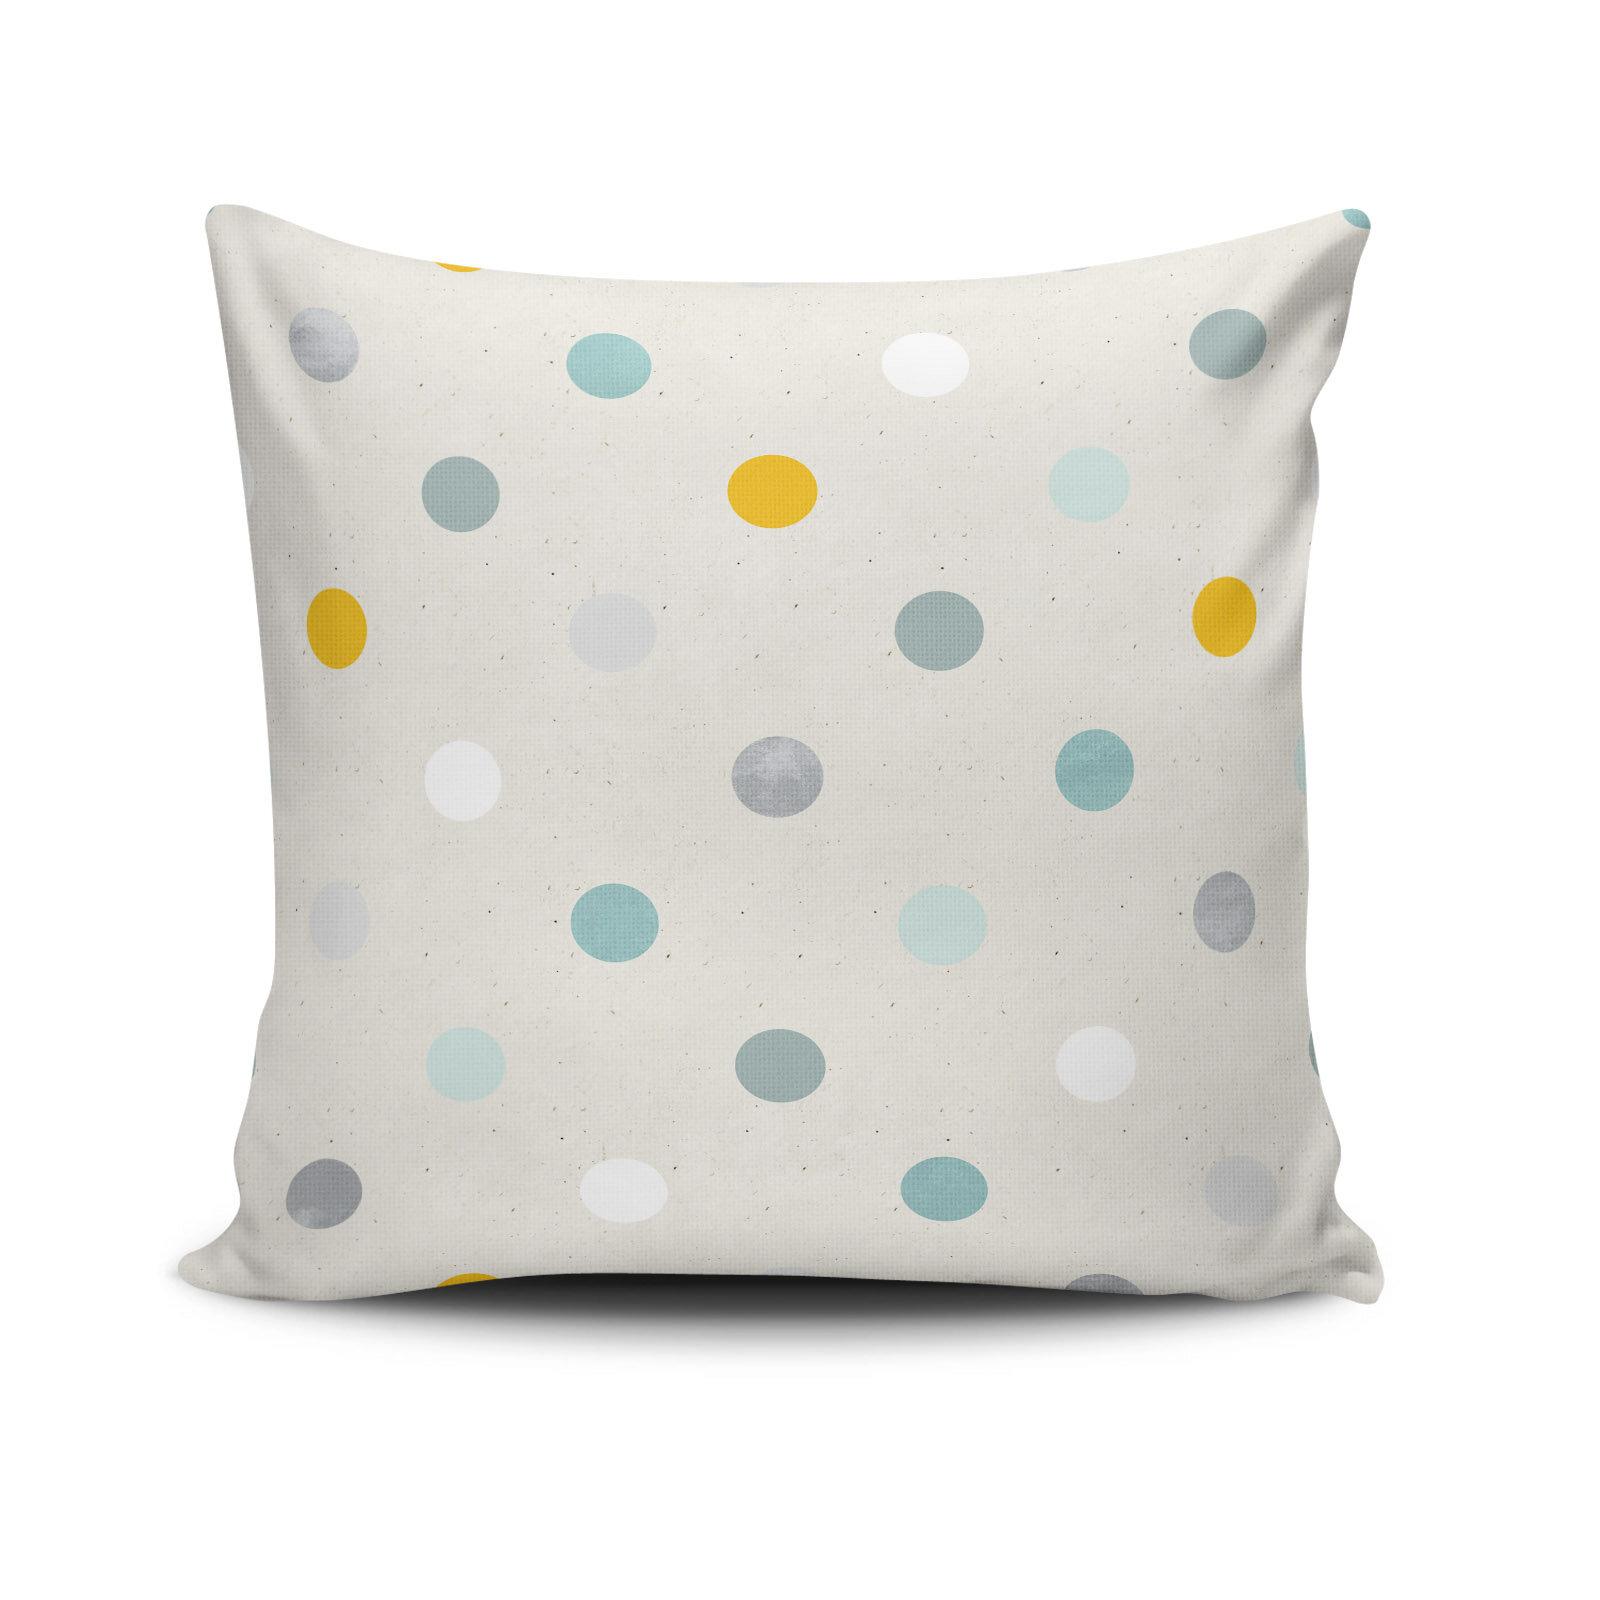 Perna decorativa Cushion Love, Dimensiune: 45 x 45 cm, Material exterior: 50% bumbac / 50% poliester 768CLV0171